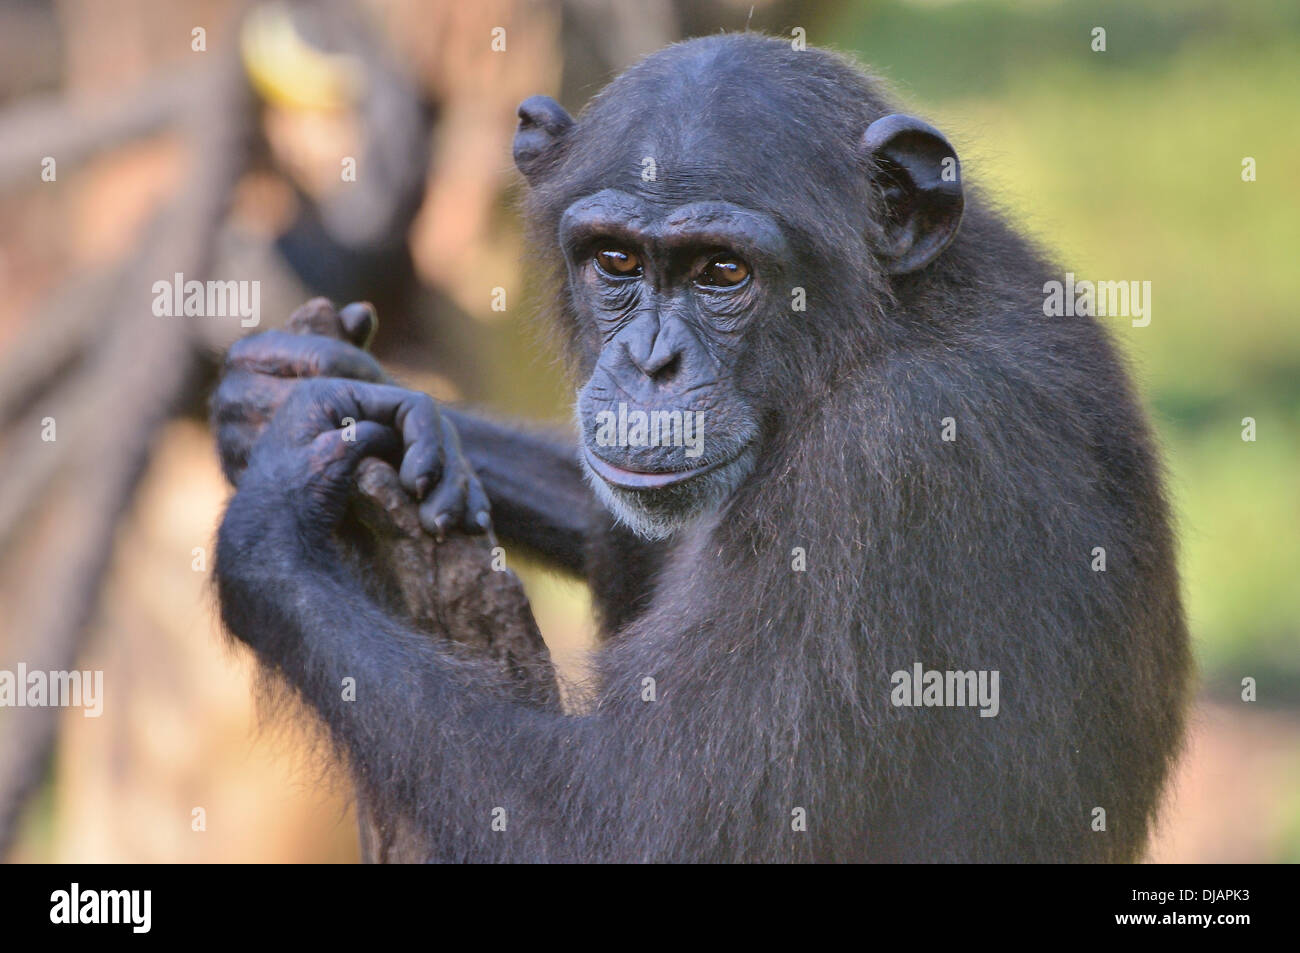 West African Chimpanzee (Pan troglodytes verus), Tacugama Chimpanzee Sanctuary, Province Western Area Tacugama, Sierra Leone Stock Photo